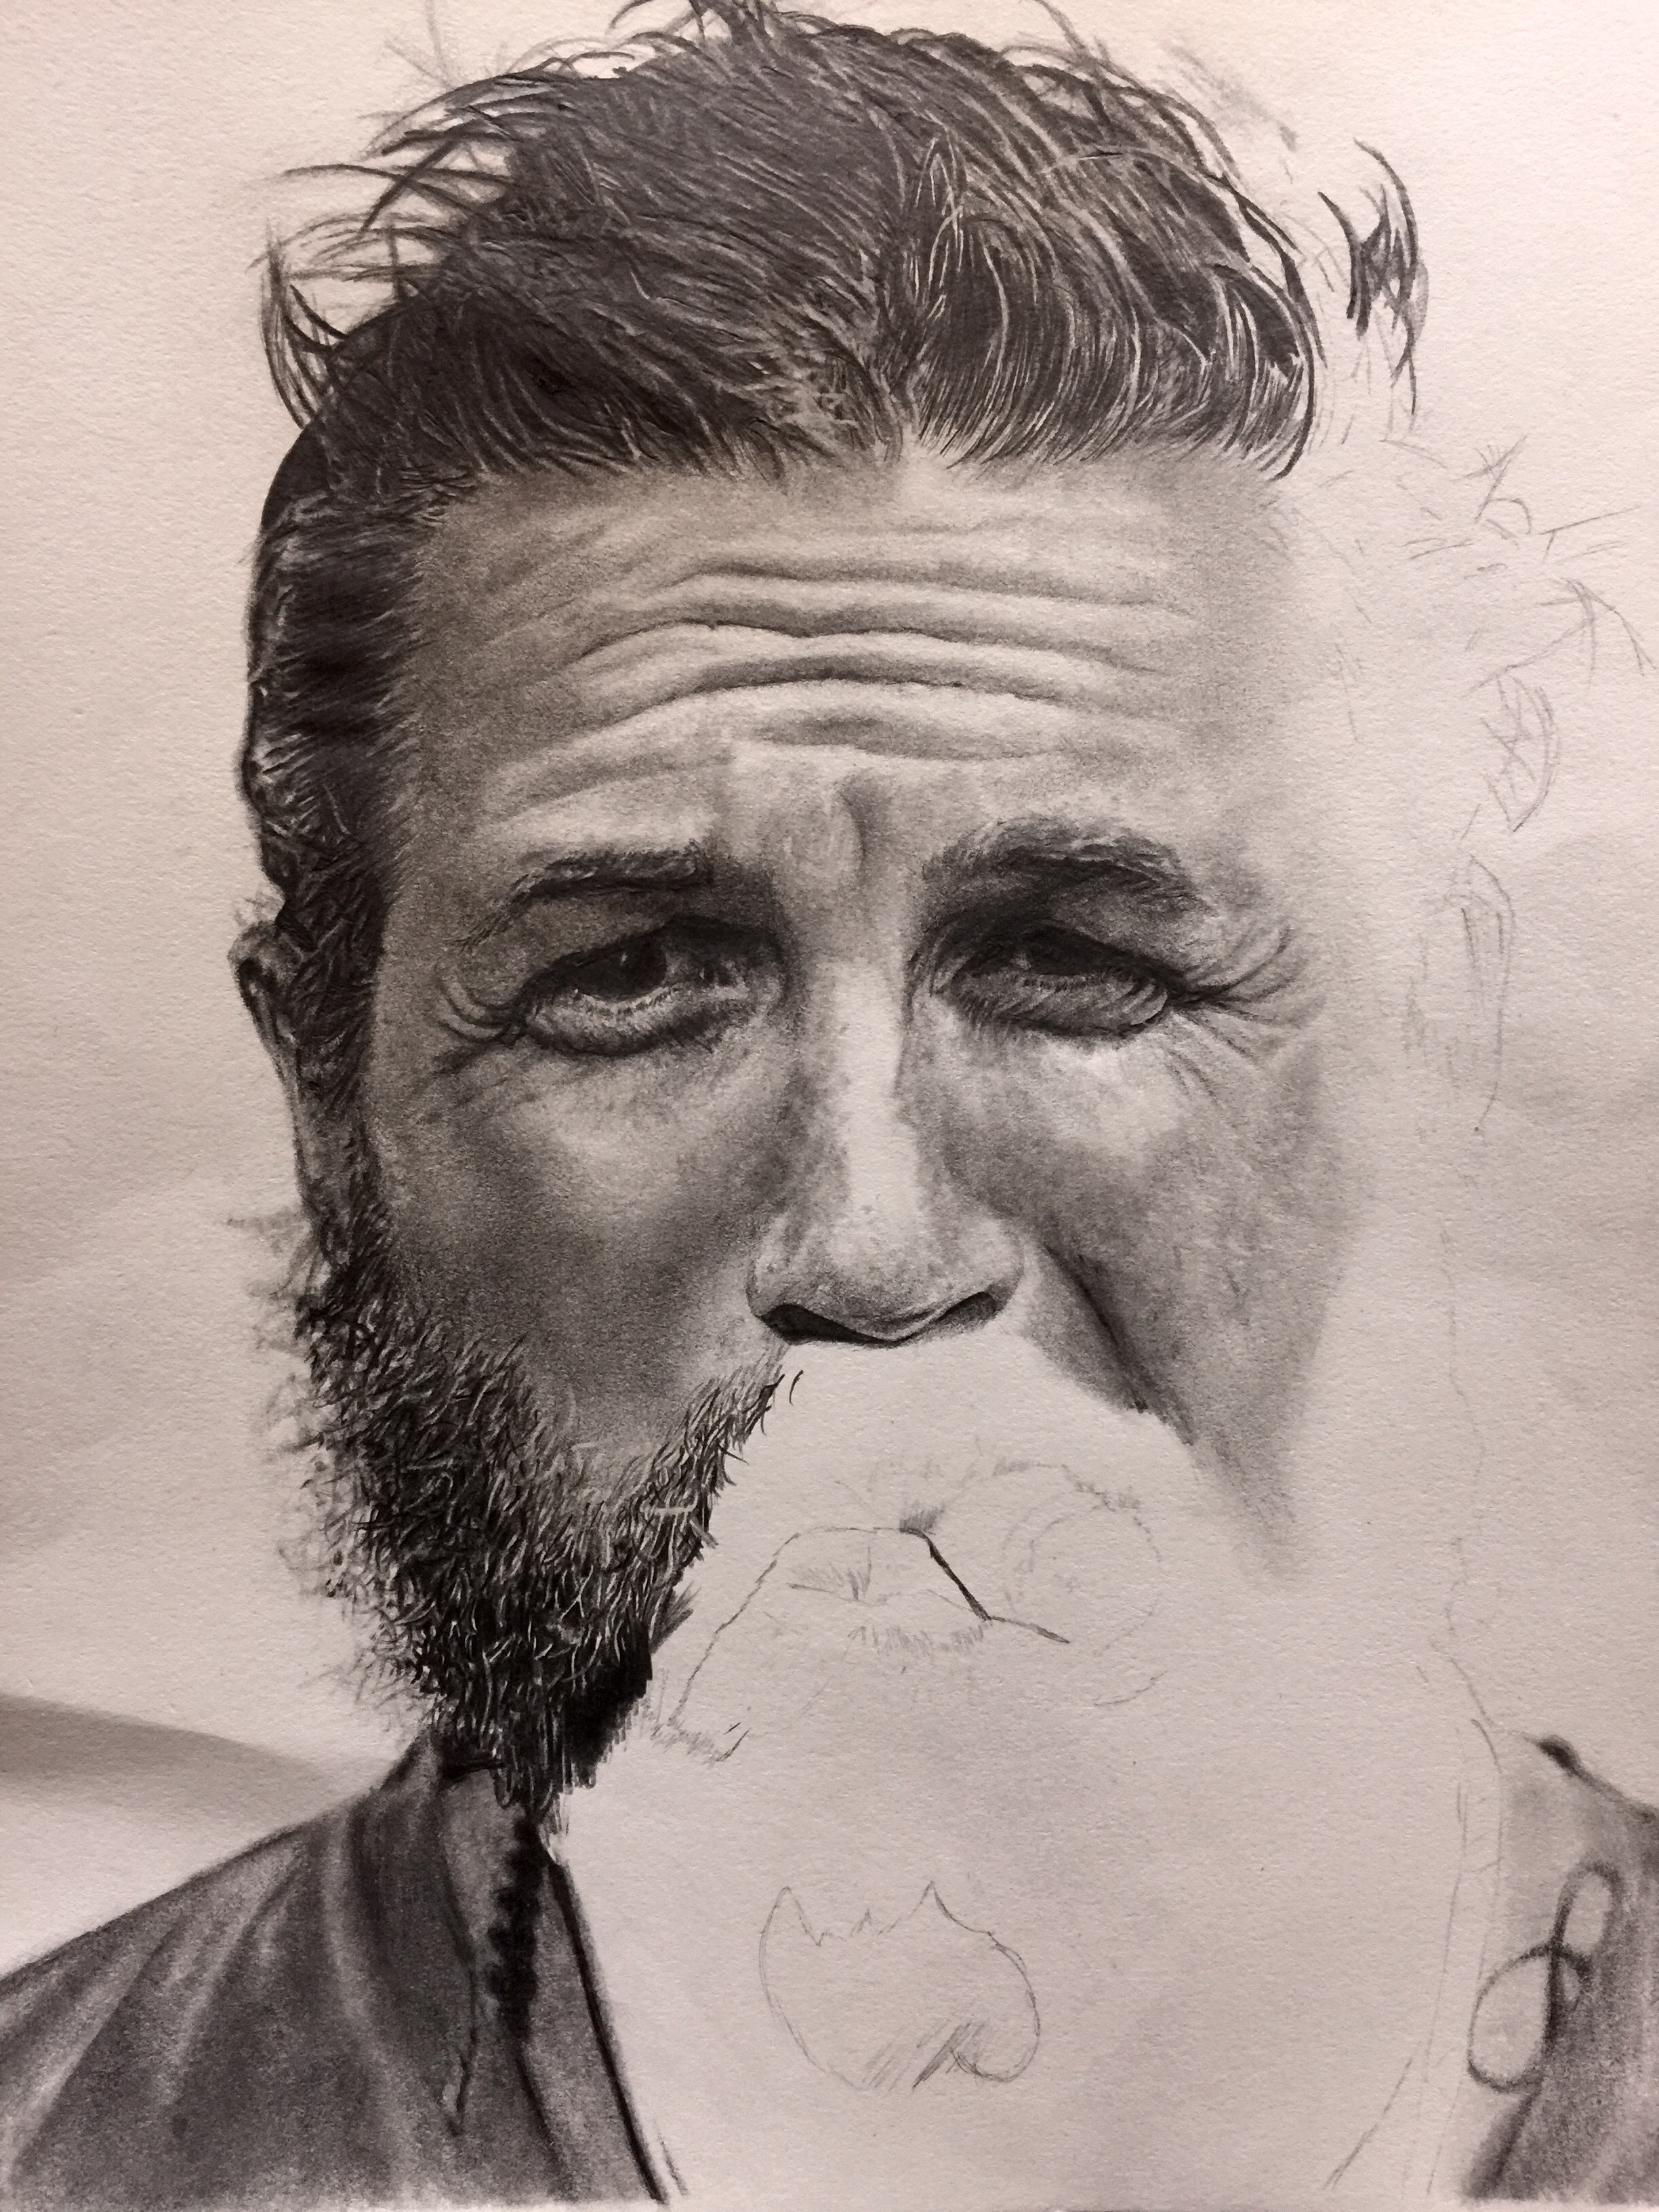 gom_hardy_cigar_drawing_progression_a_rajzolas_folyamata_szivarozas_5.jpg